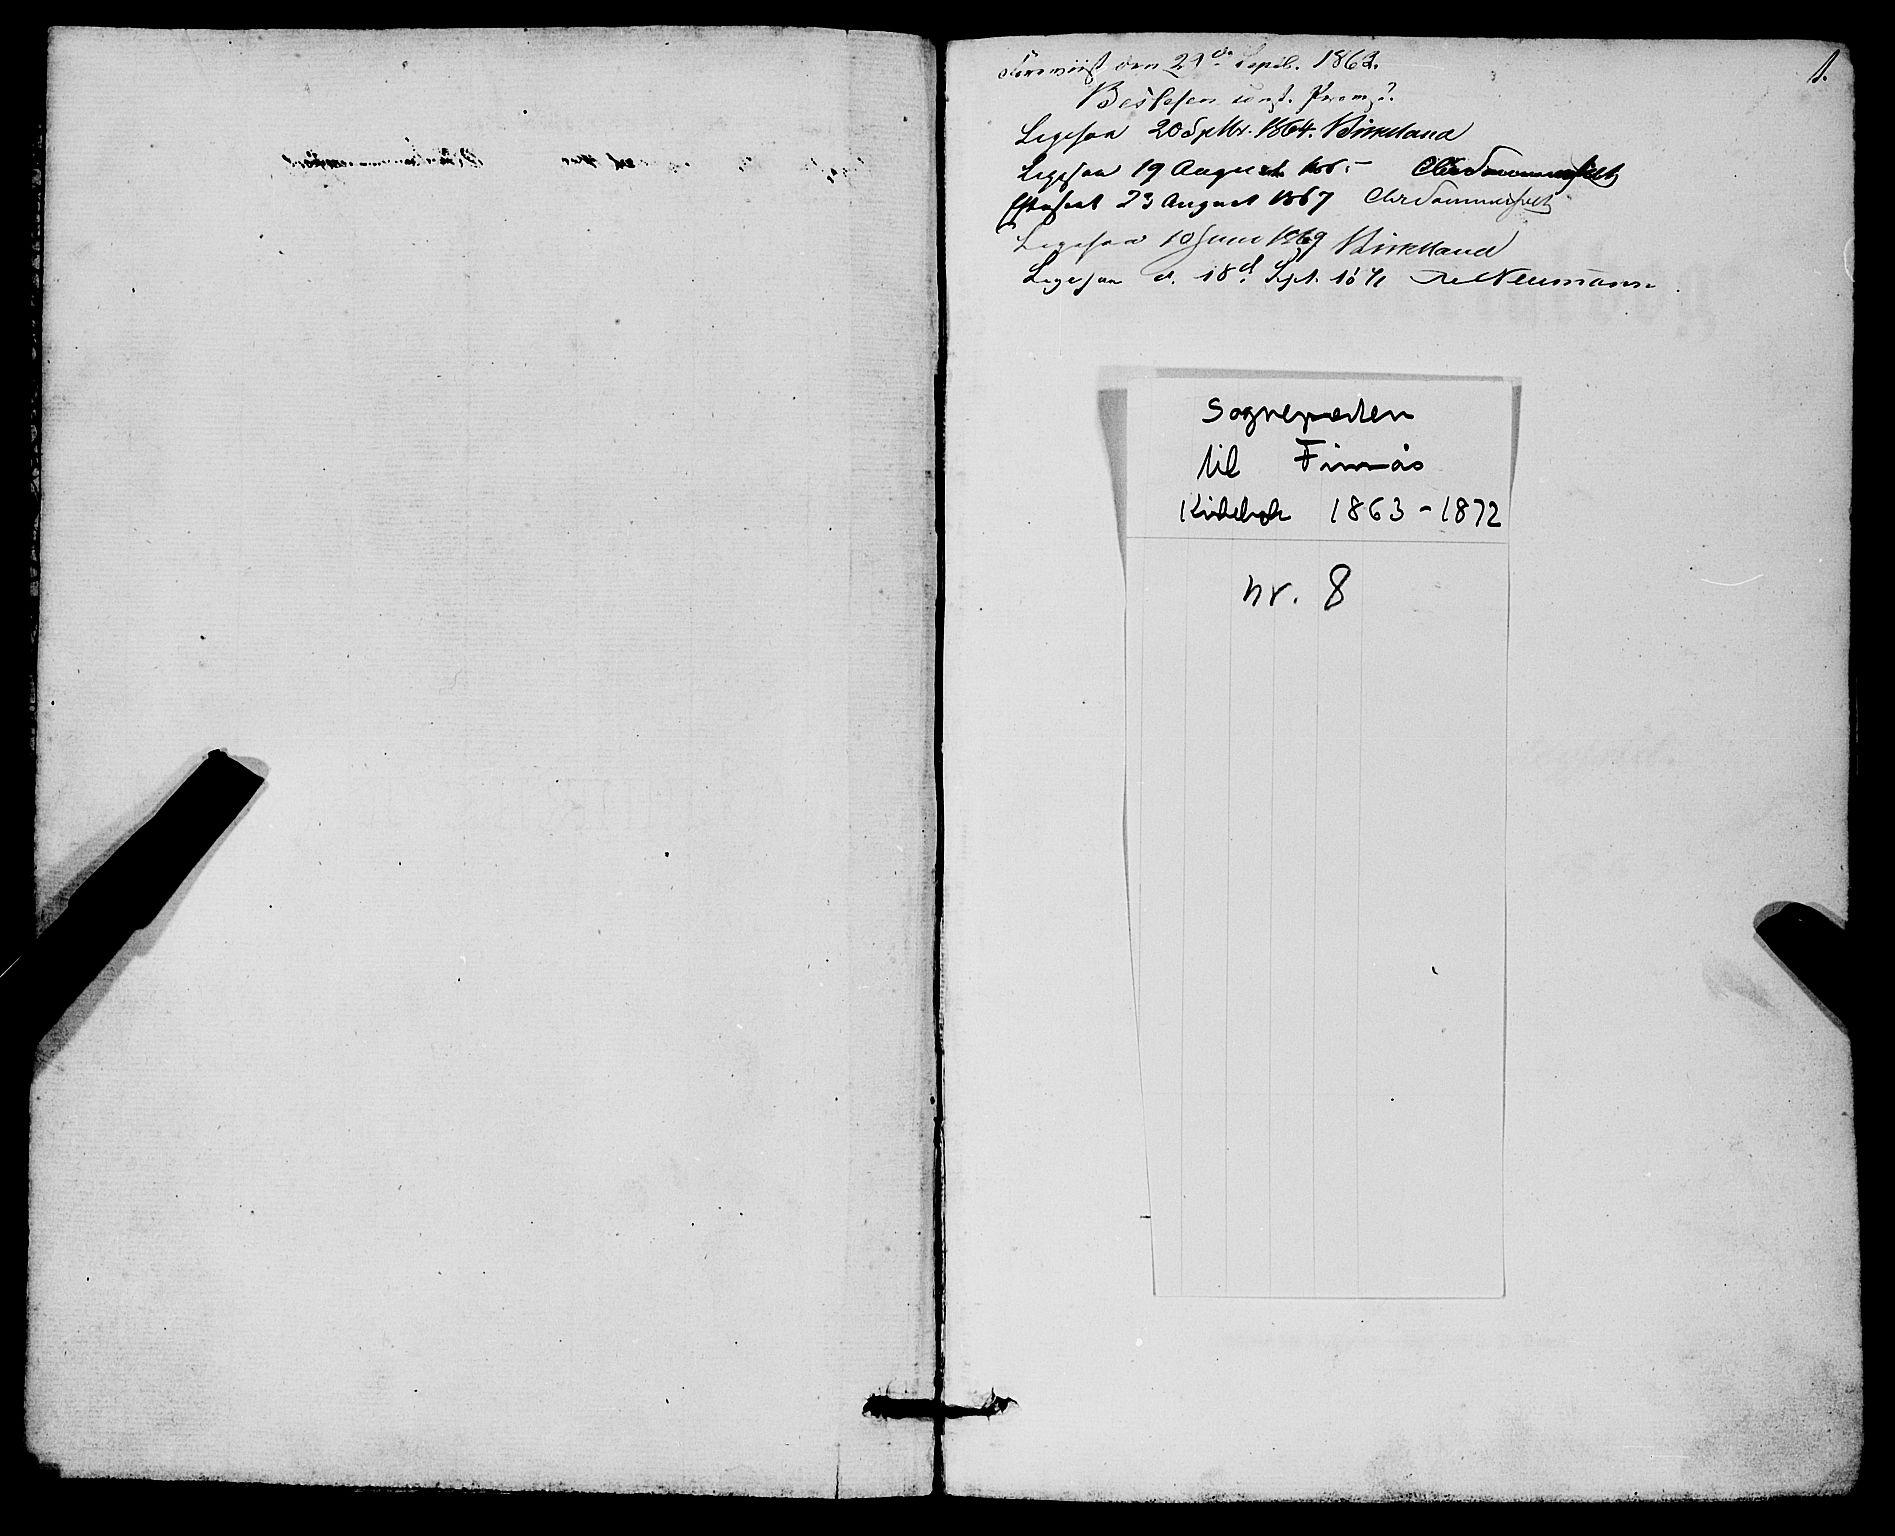 SAB, Finnås sokneprestembete, H/Ha/Haa/Haaa/L0008: Ministerialbok nr. A 8, 1863-1872, s. 1